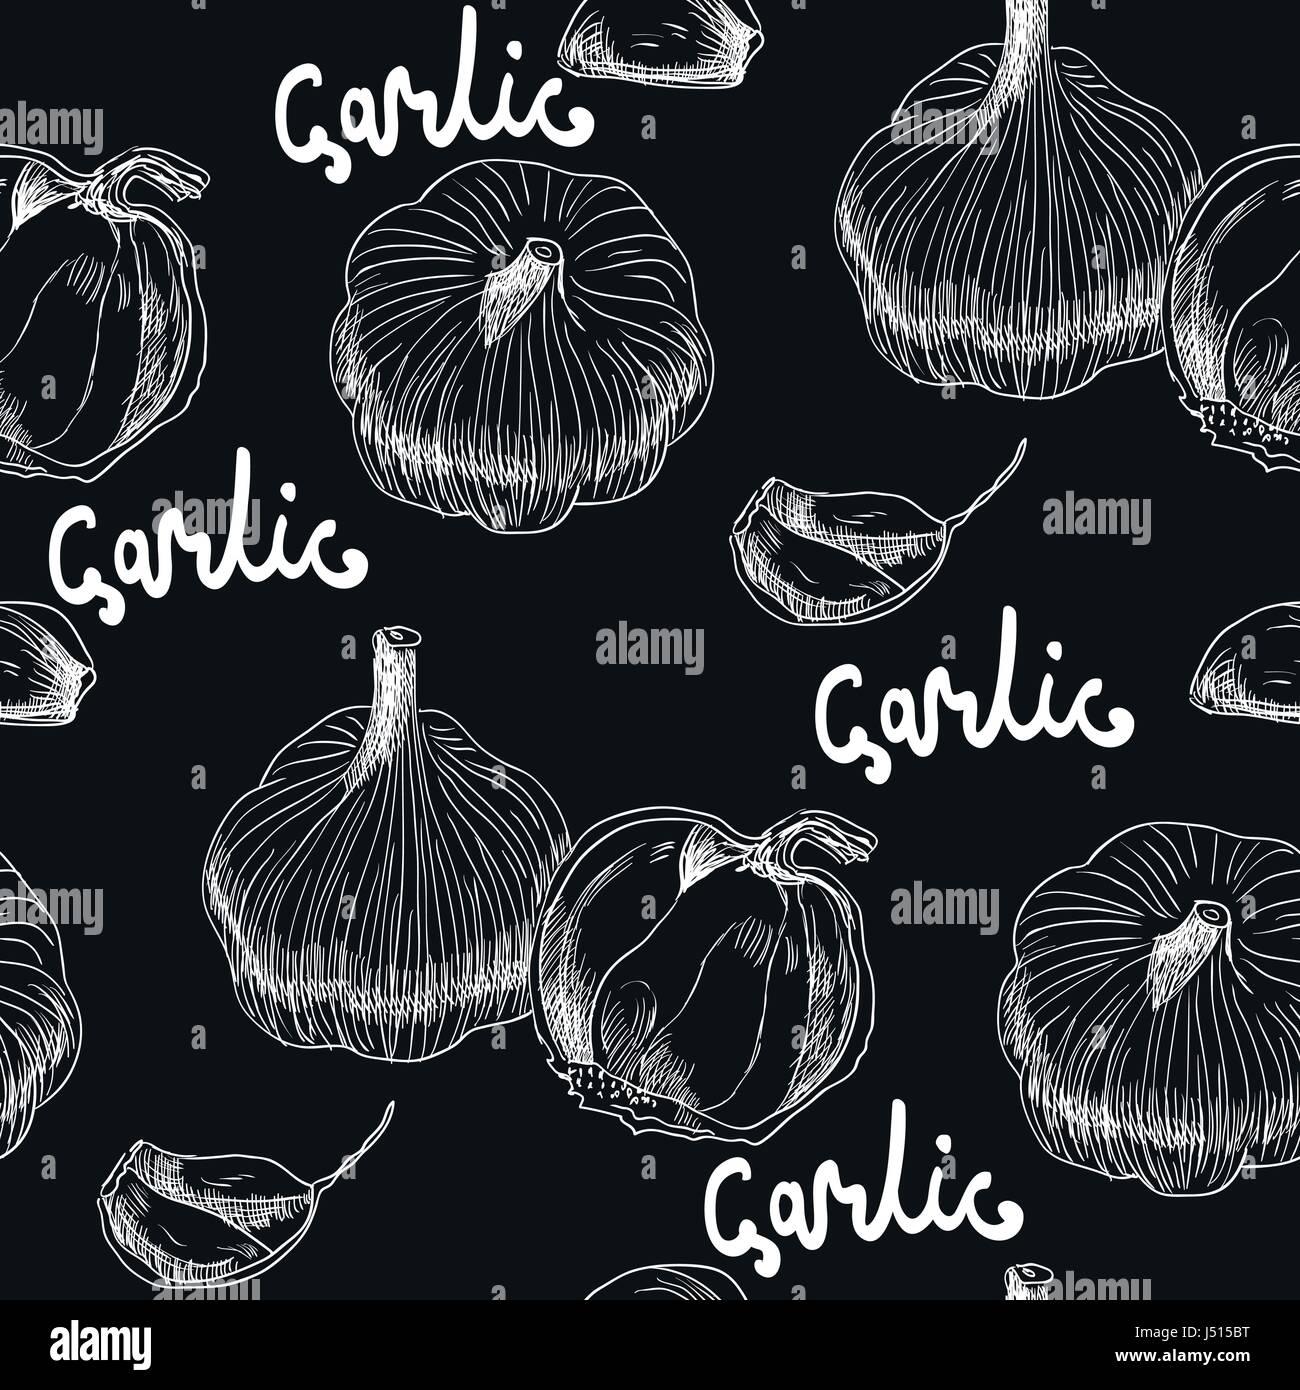 illustration with garlics - Stock Vector